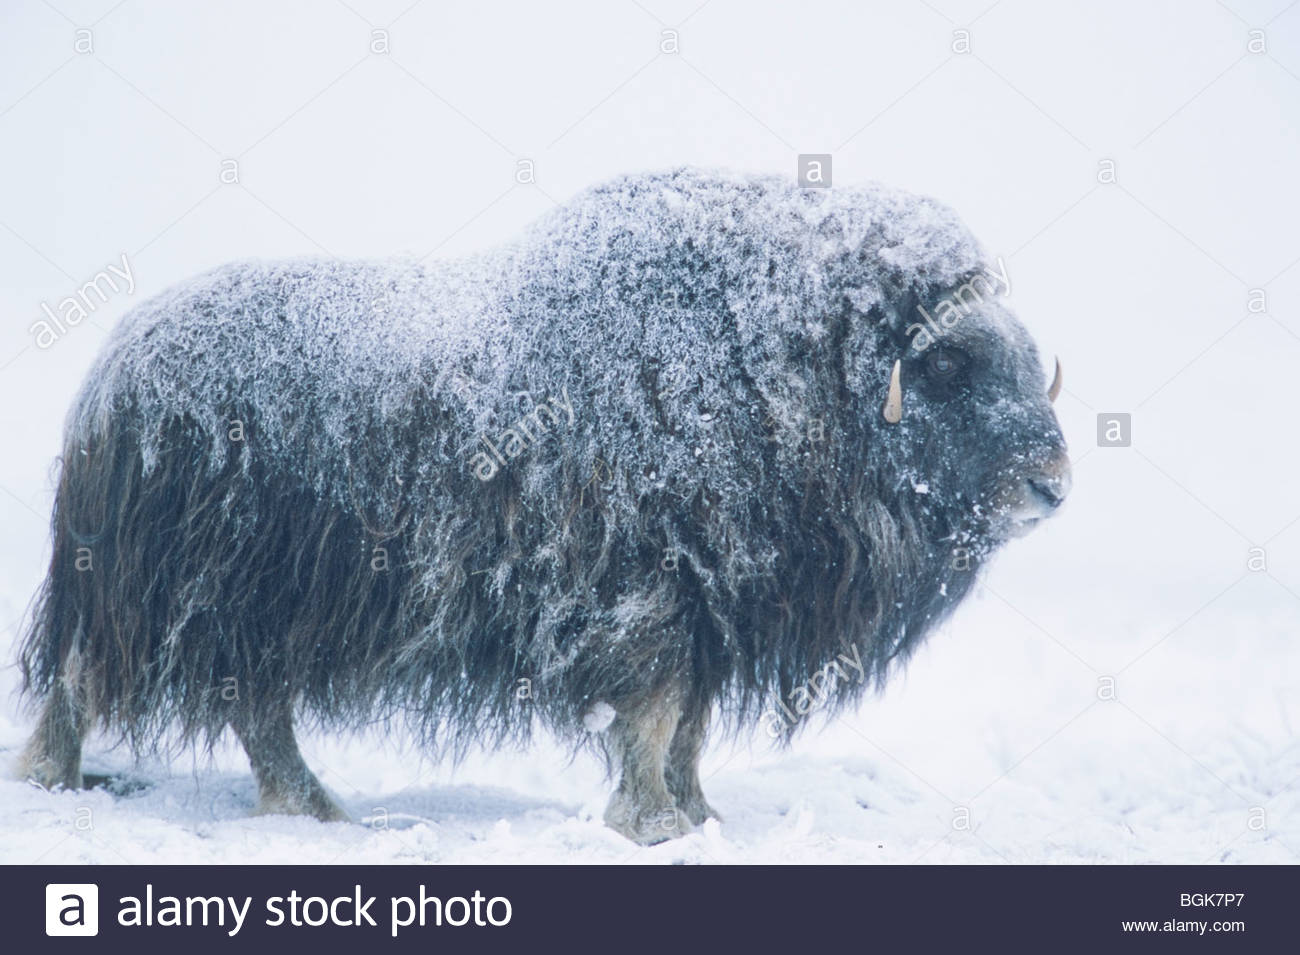 Alaska, Arctic National Wildlife Refuge / ANWR. Frozen tundra in winter hosts the Musk Ox, a prehistoric mammal - Stock Image